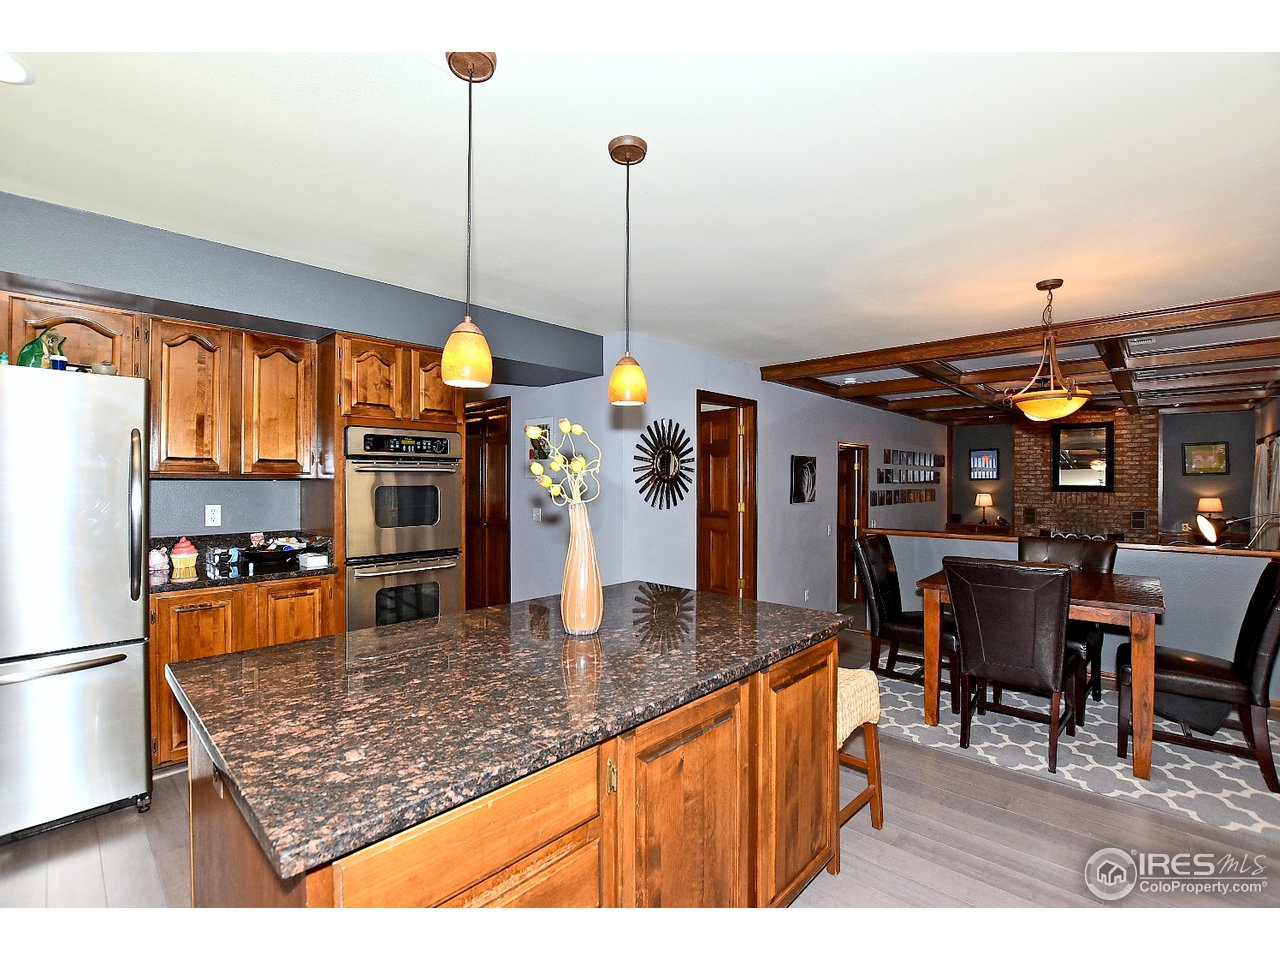 Kitchen, stainless steel appliances